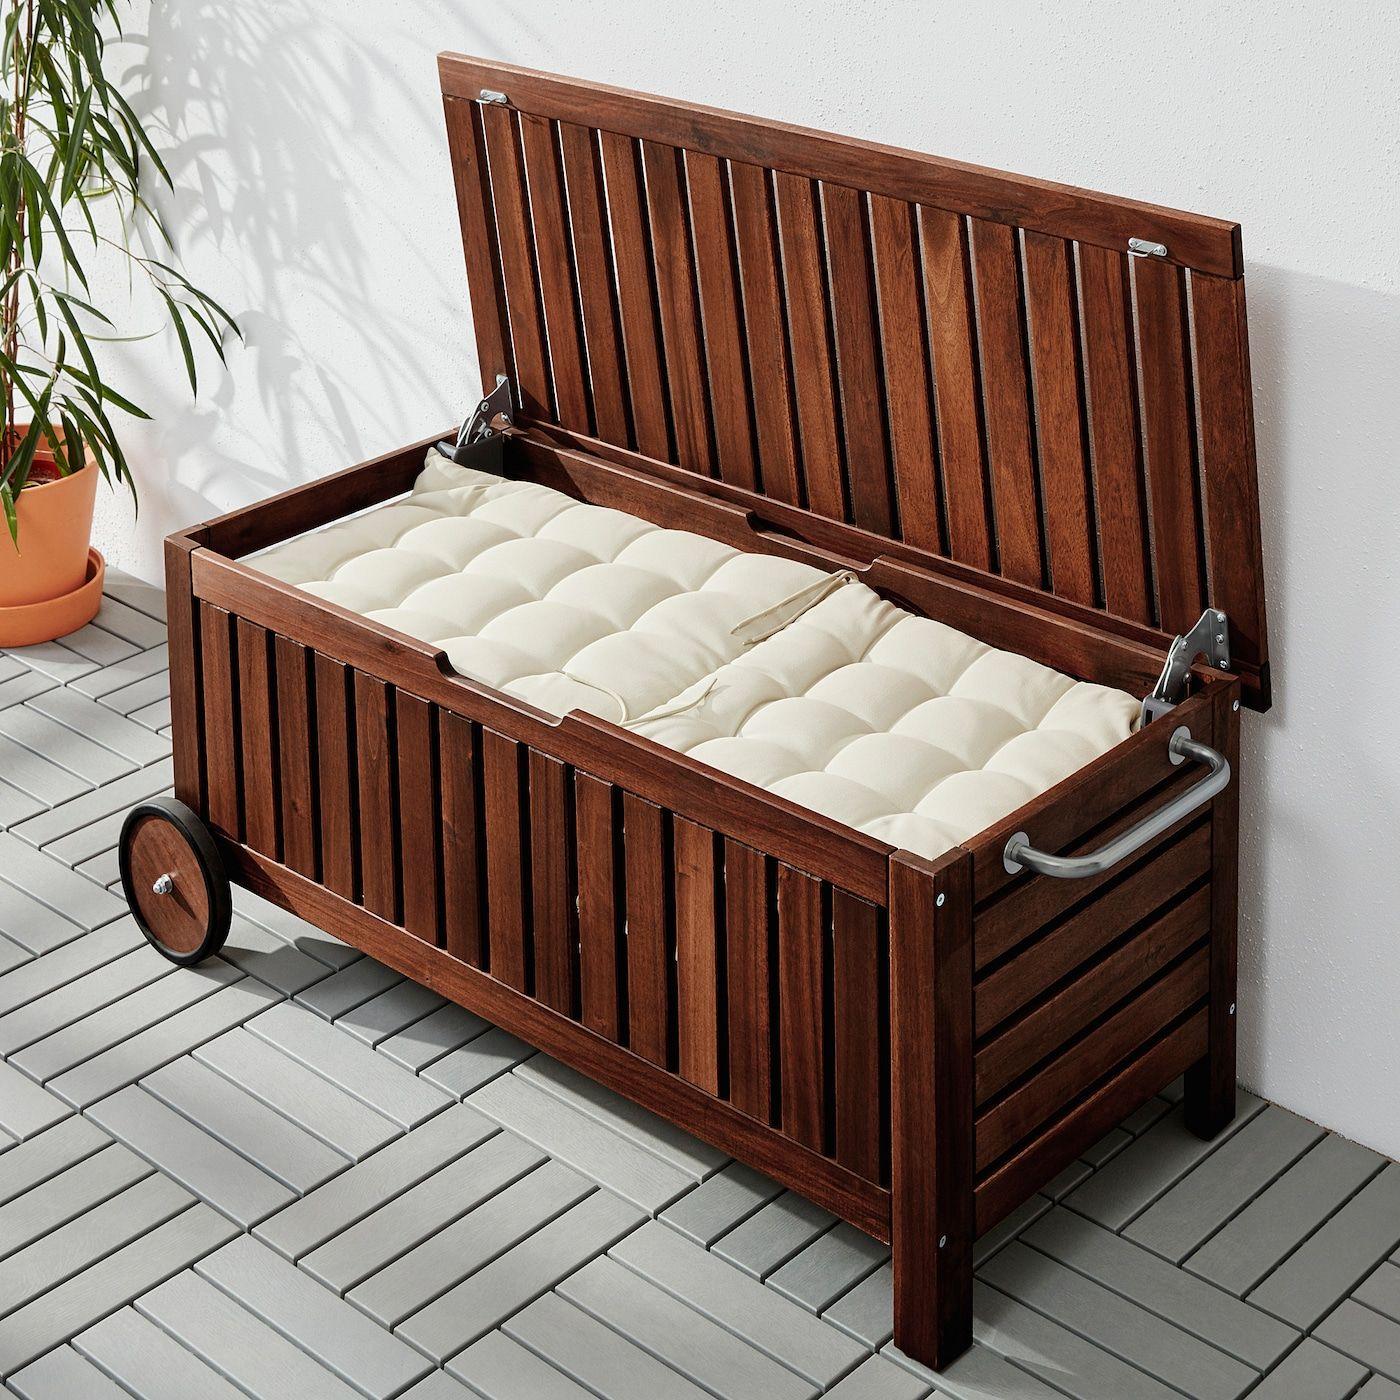 Applaro Storage Bench Outdoor Brown Stained Brown Width 50 3 8